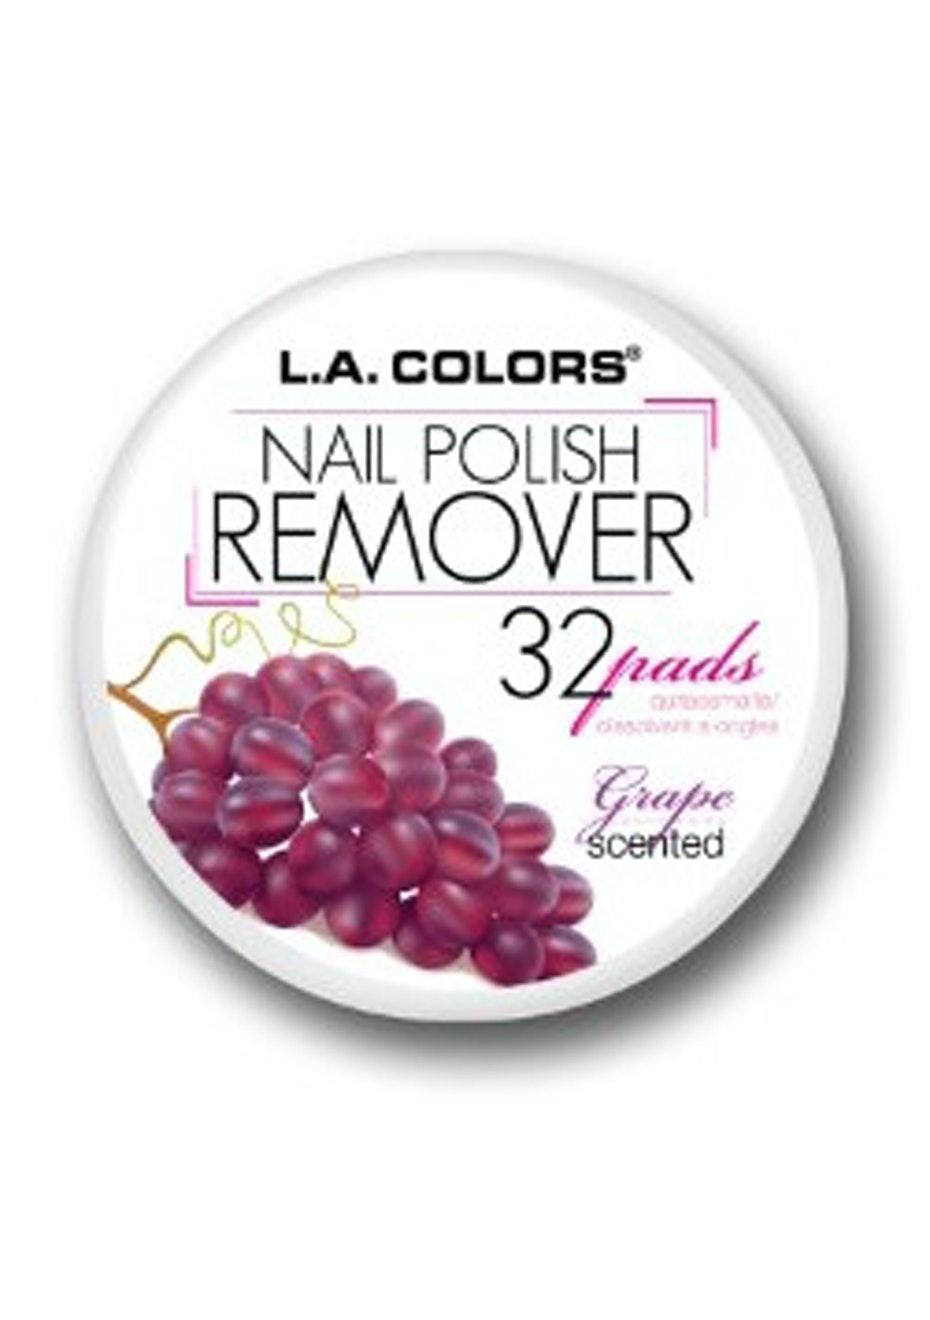 LA COLORS - Nail Polish Remover Pads  - Grape